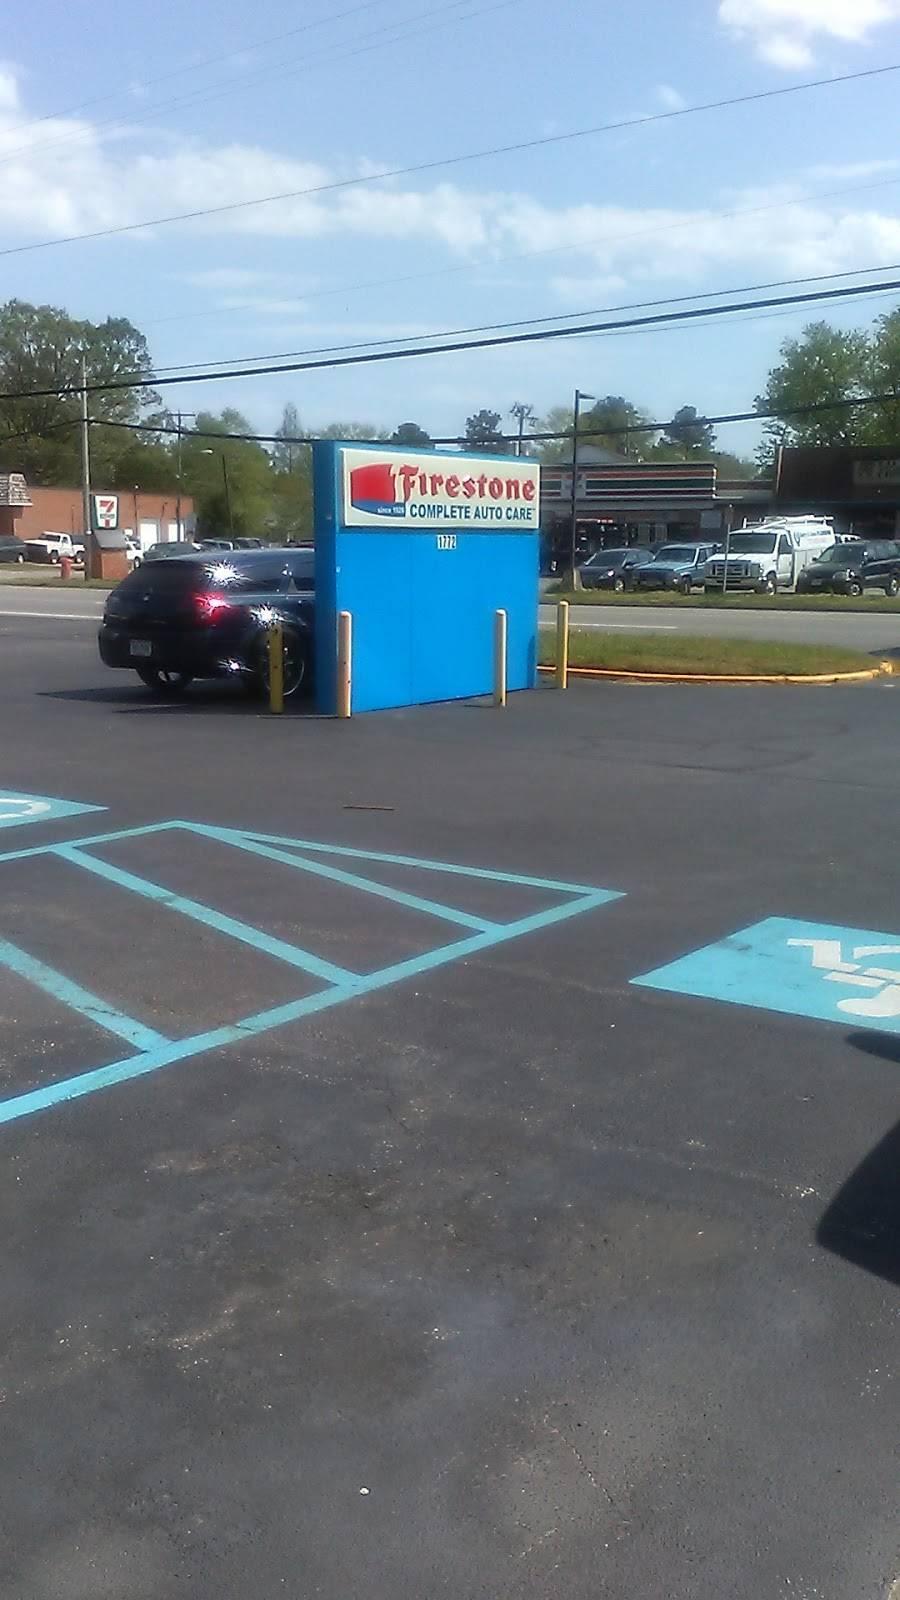 Firestone Complete Auto Care - car repair  | Photo 7 of 10 | Address: 1772 Virginia Beach Blvd, Virginia Beach, VA 23454, USA | Phone: (757) 918-7831